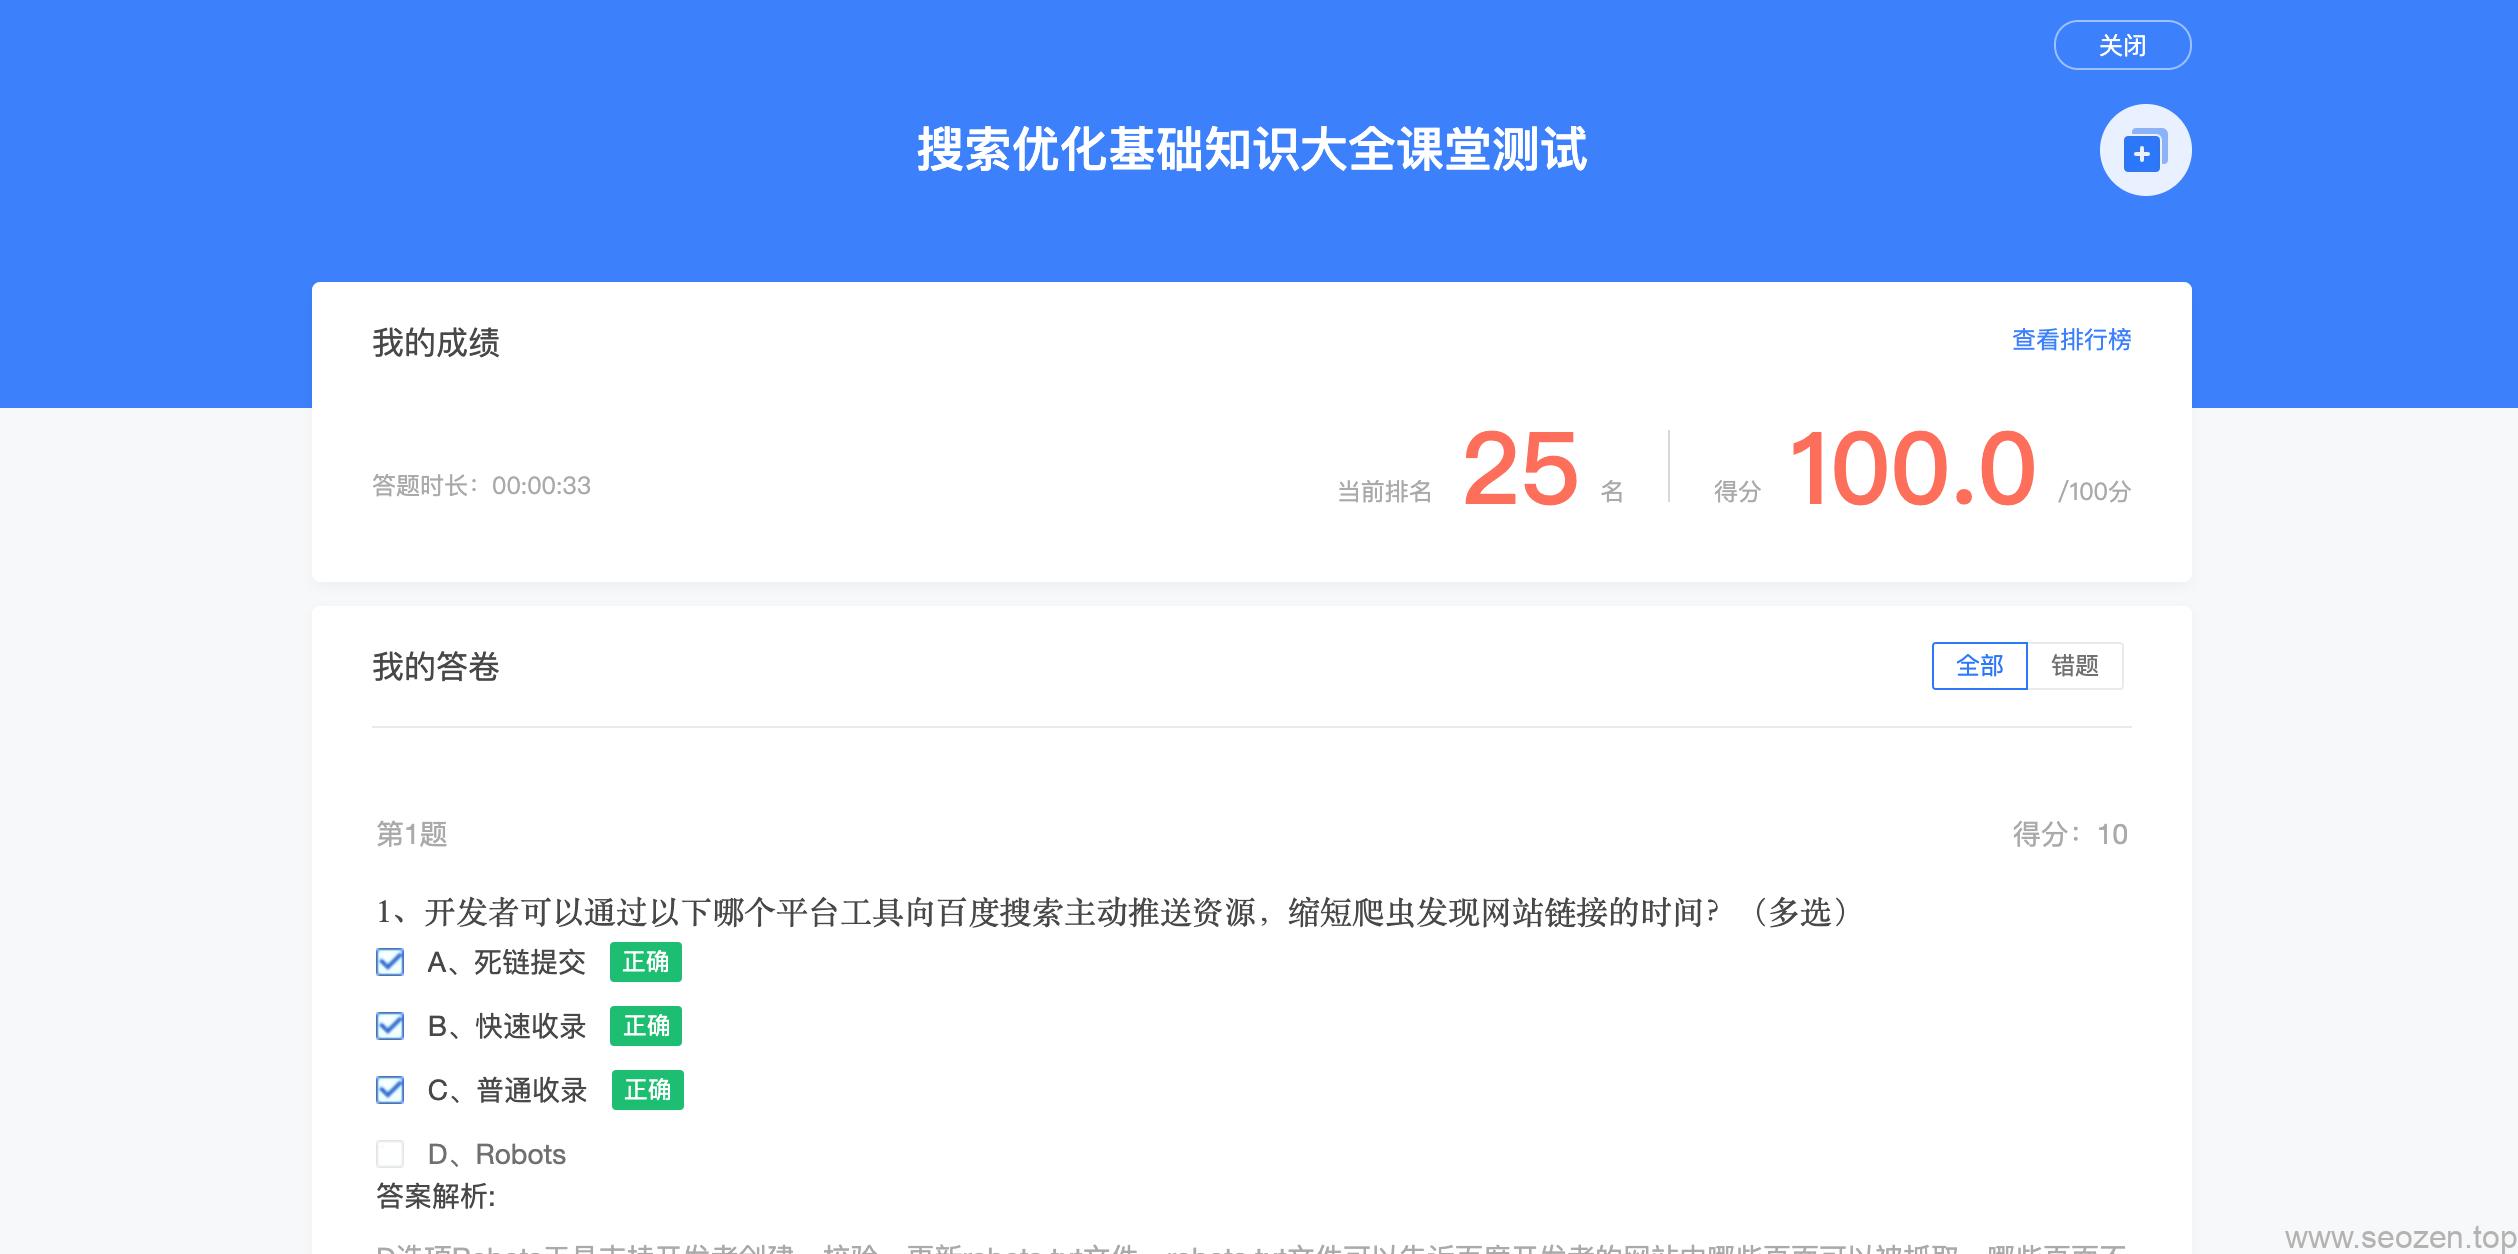 seozen-baidu-seo-basic-reward